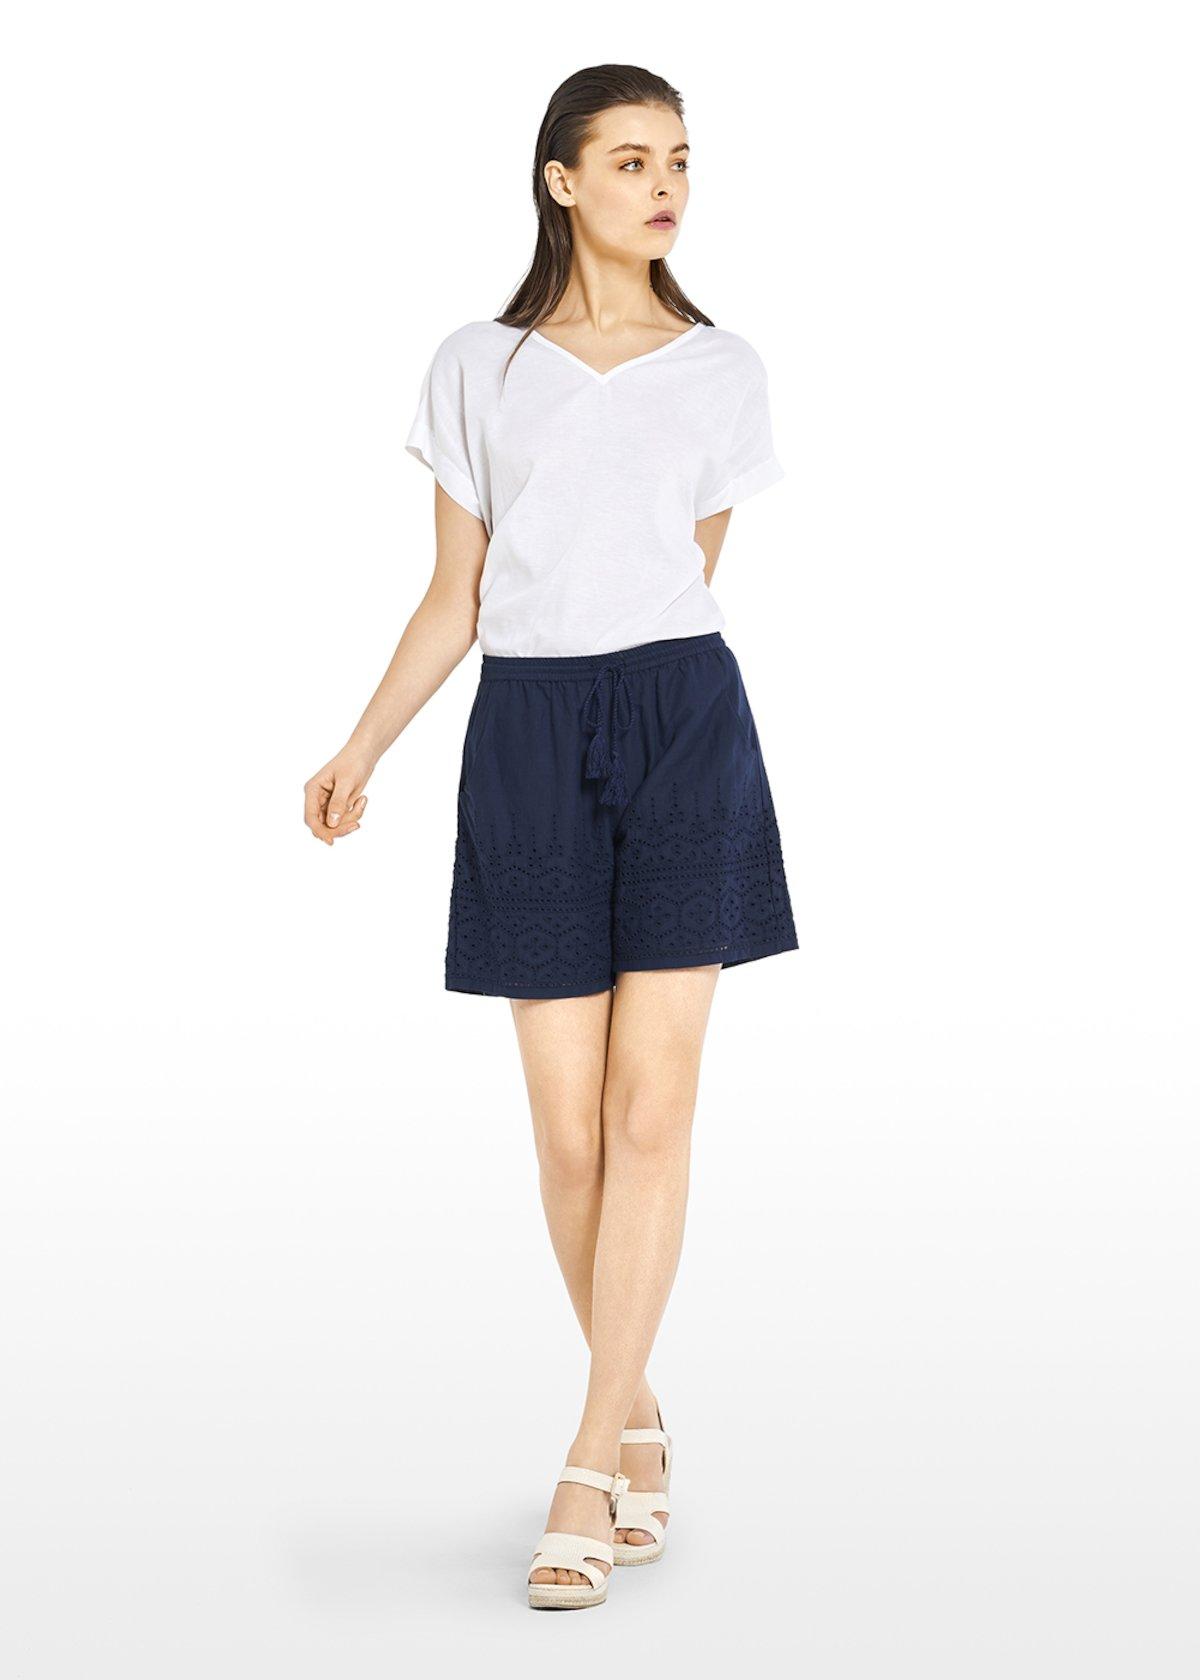 Sibylla T-shirt in linen blend with V-neck